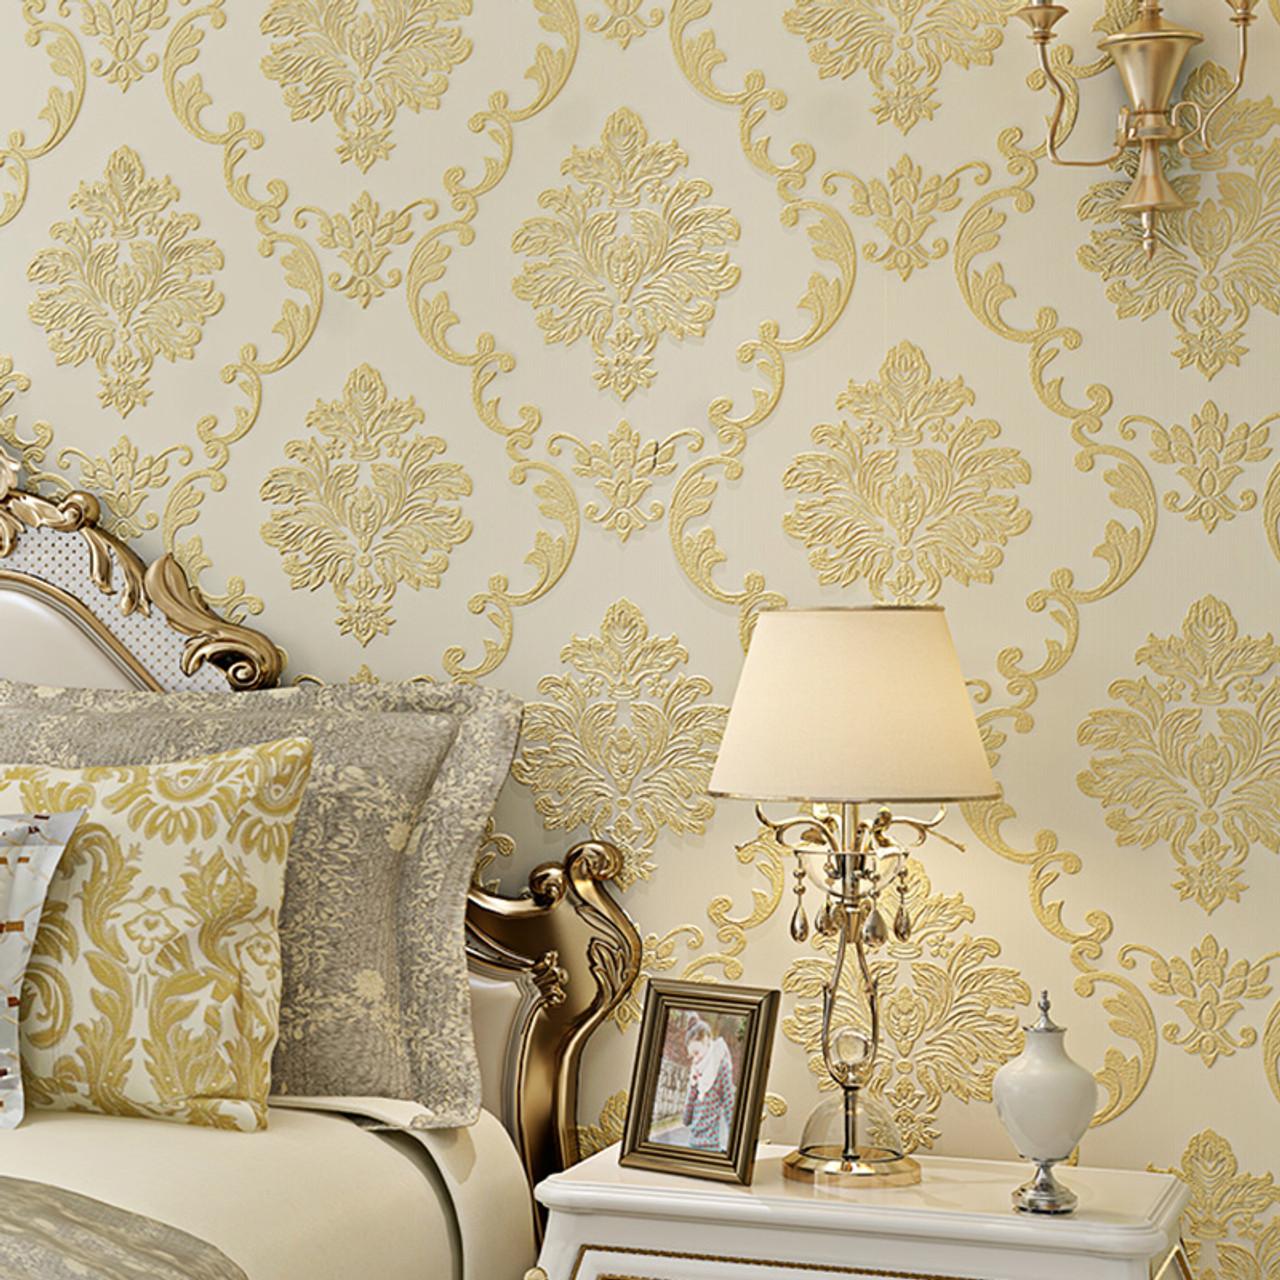 Top Secret Living Room Wallpaper Gallery @house2homegoods.net